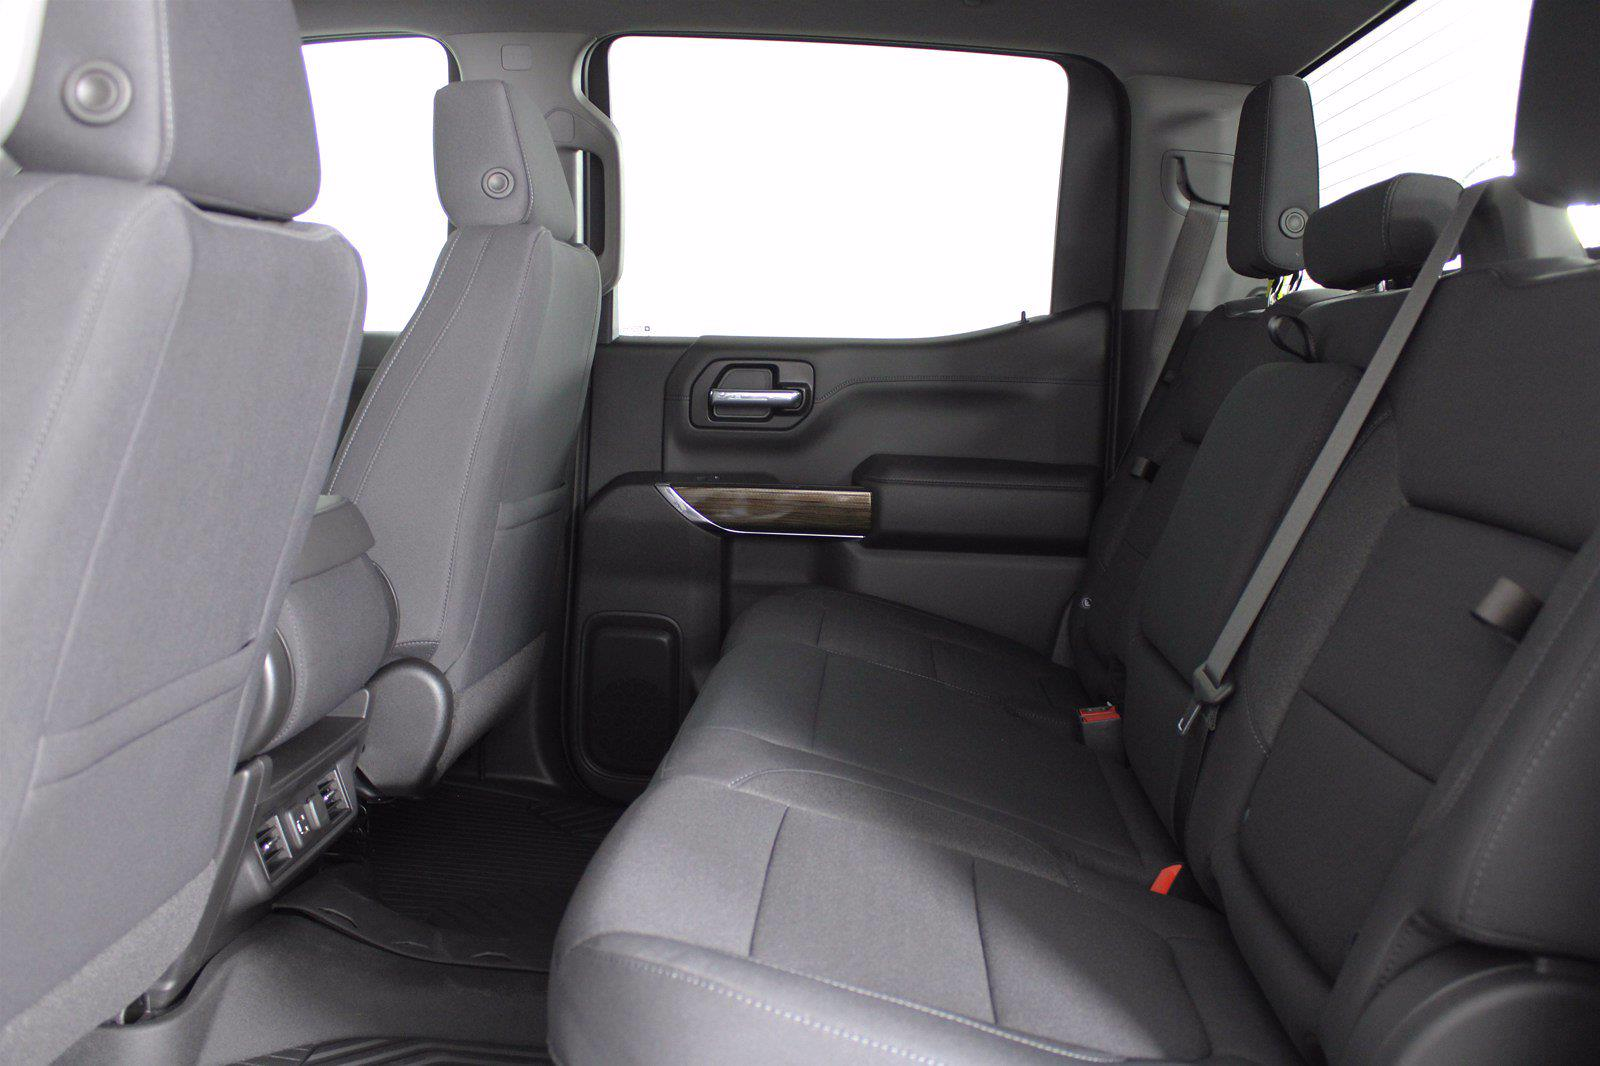 2021 Chevrolet Silverado 1500 Crew Cab 4x4, Pickup #D111144 - photo 16